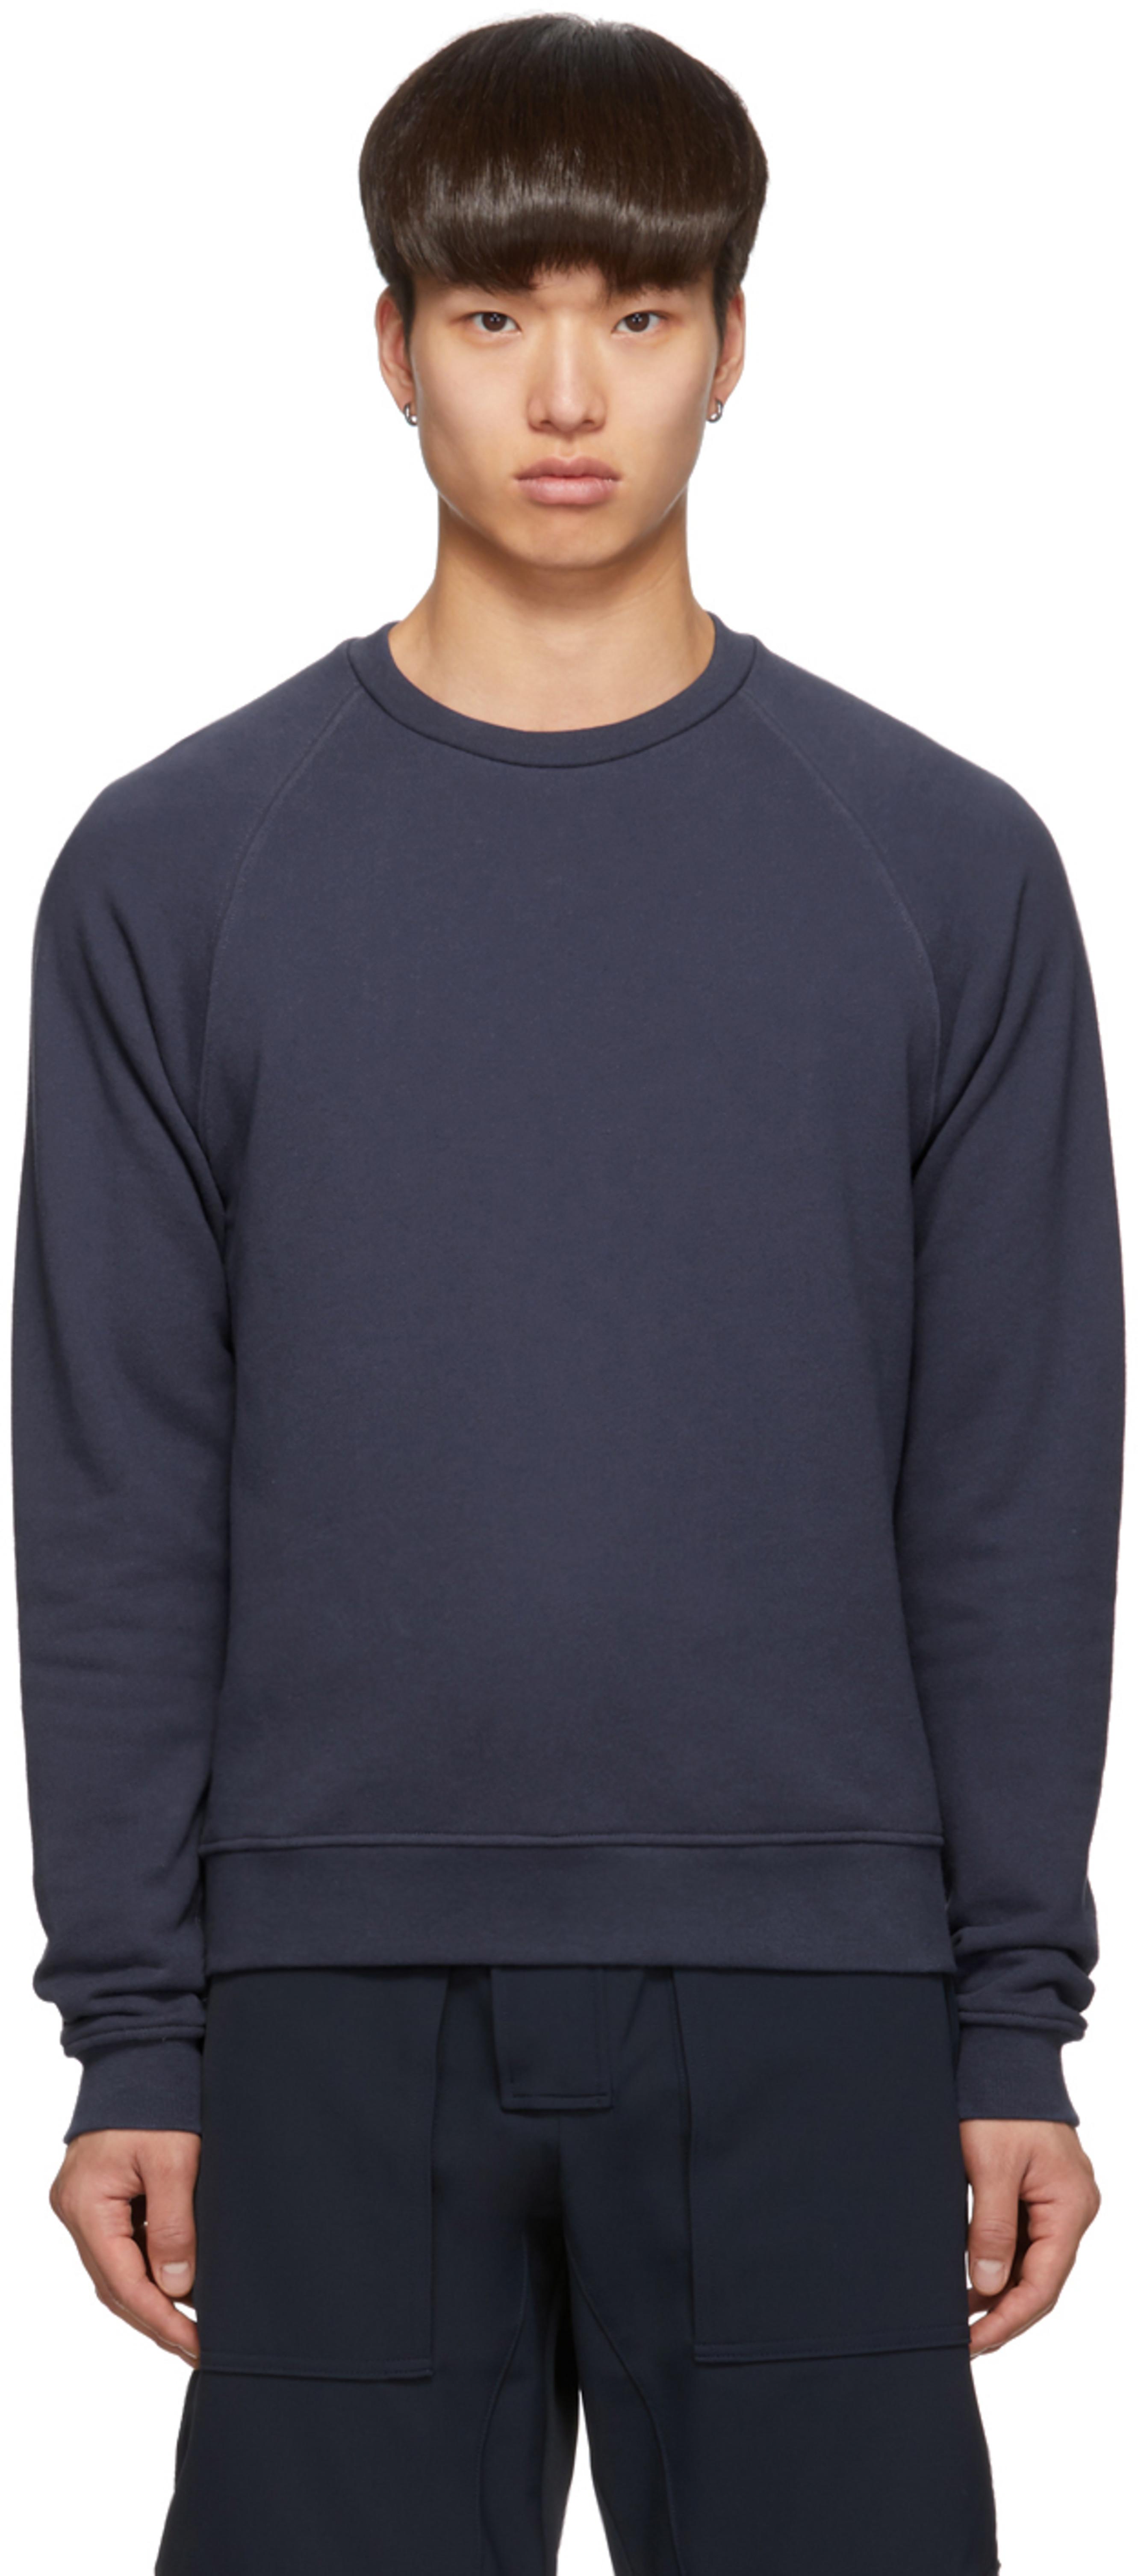 ef8b41b818 Navy Raglan Crew Sweatshirt